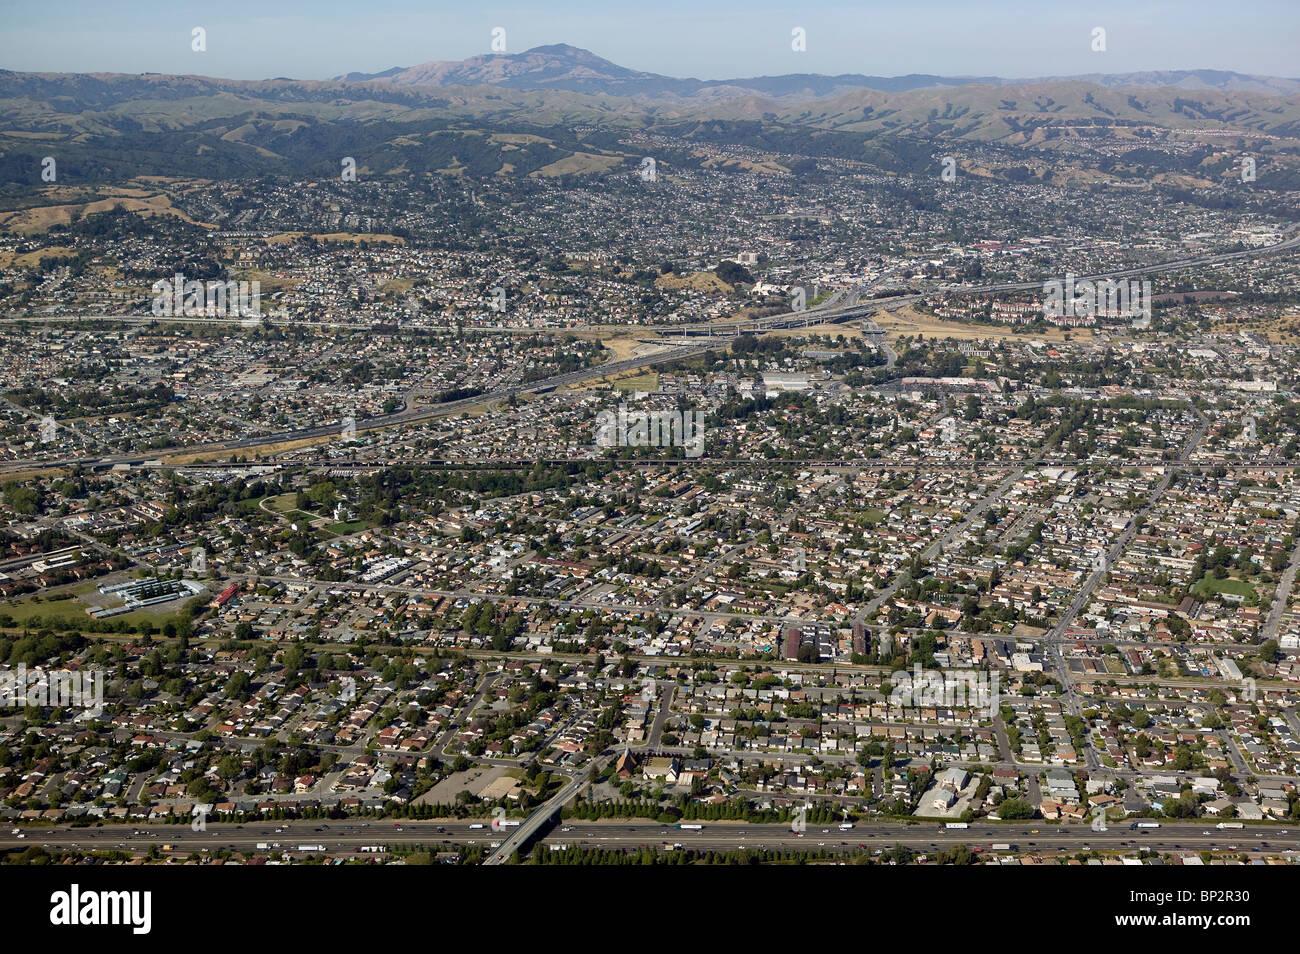 aerial view above housing density along Hayward fault Hayward California - Stock Image